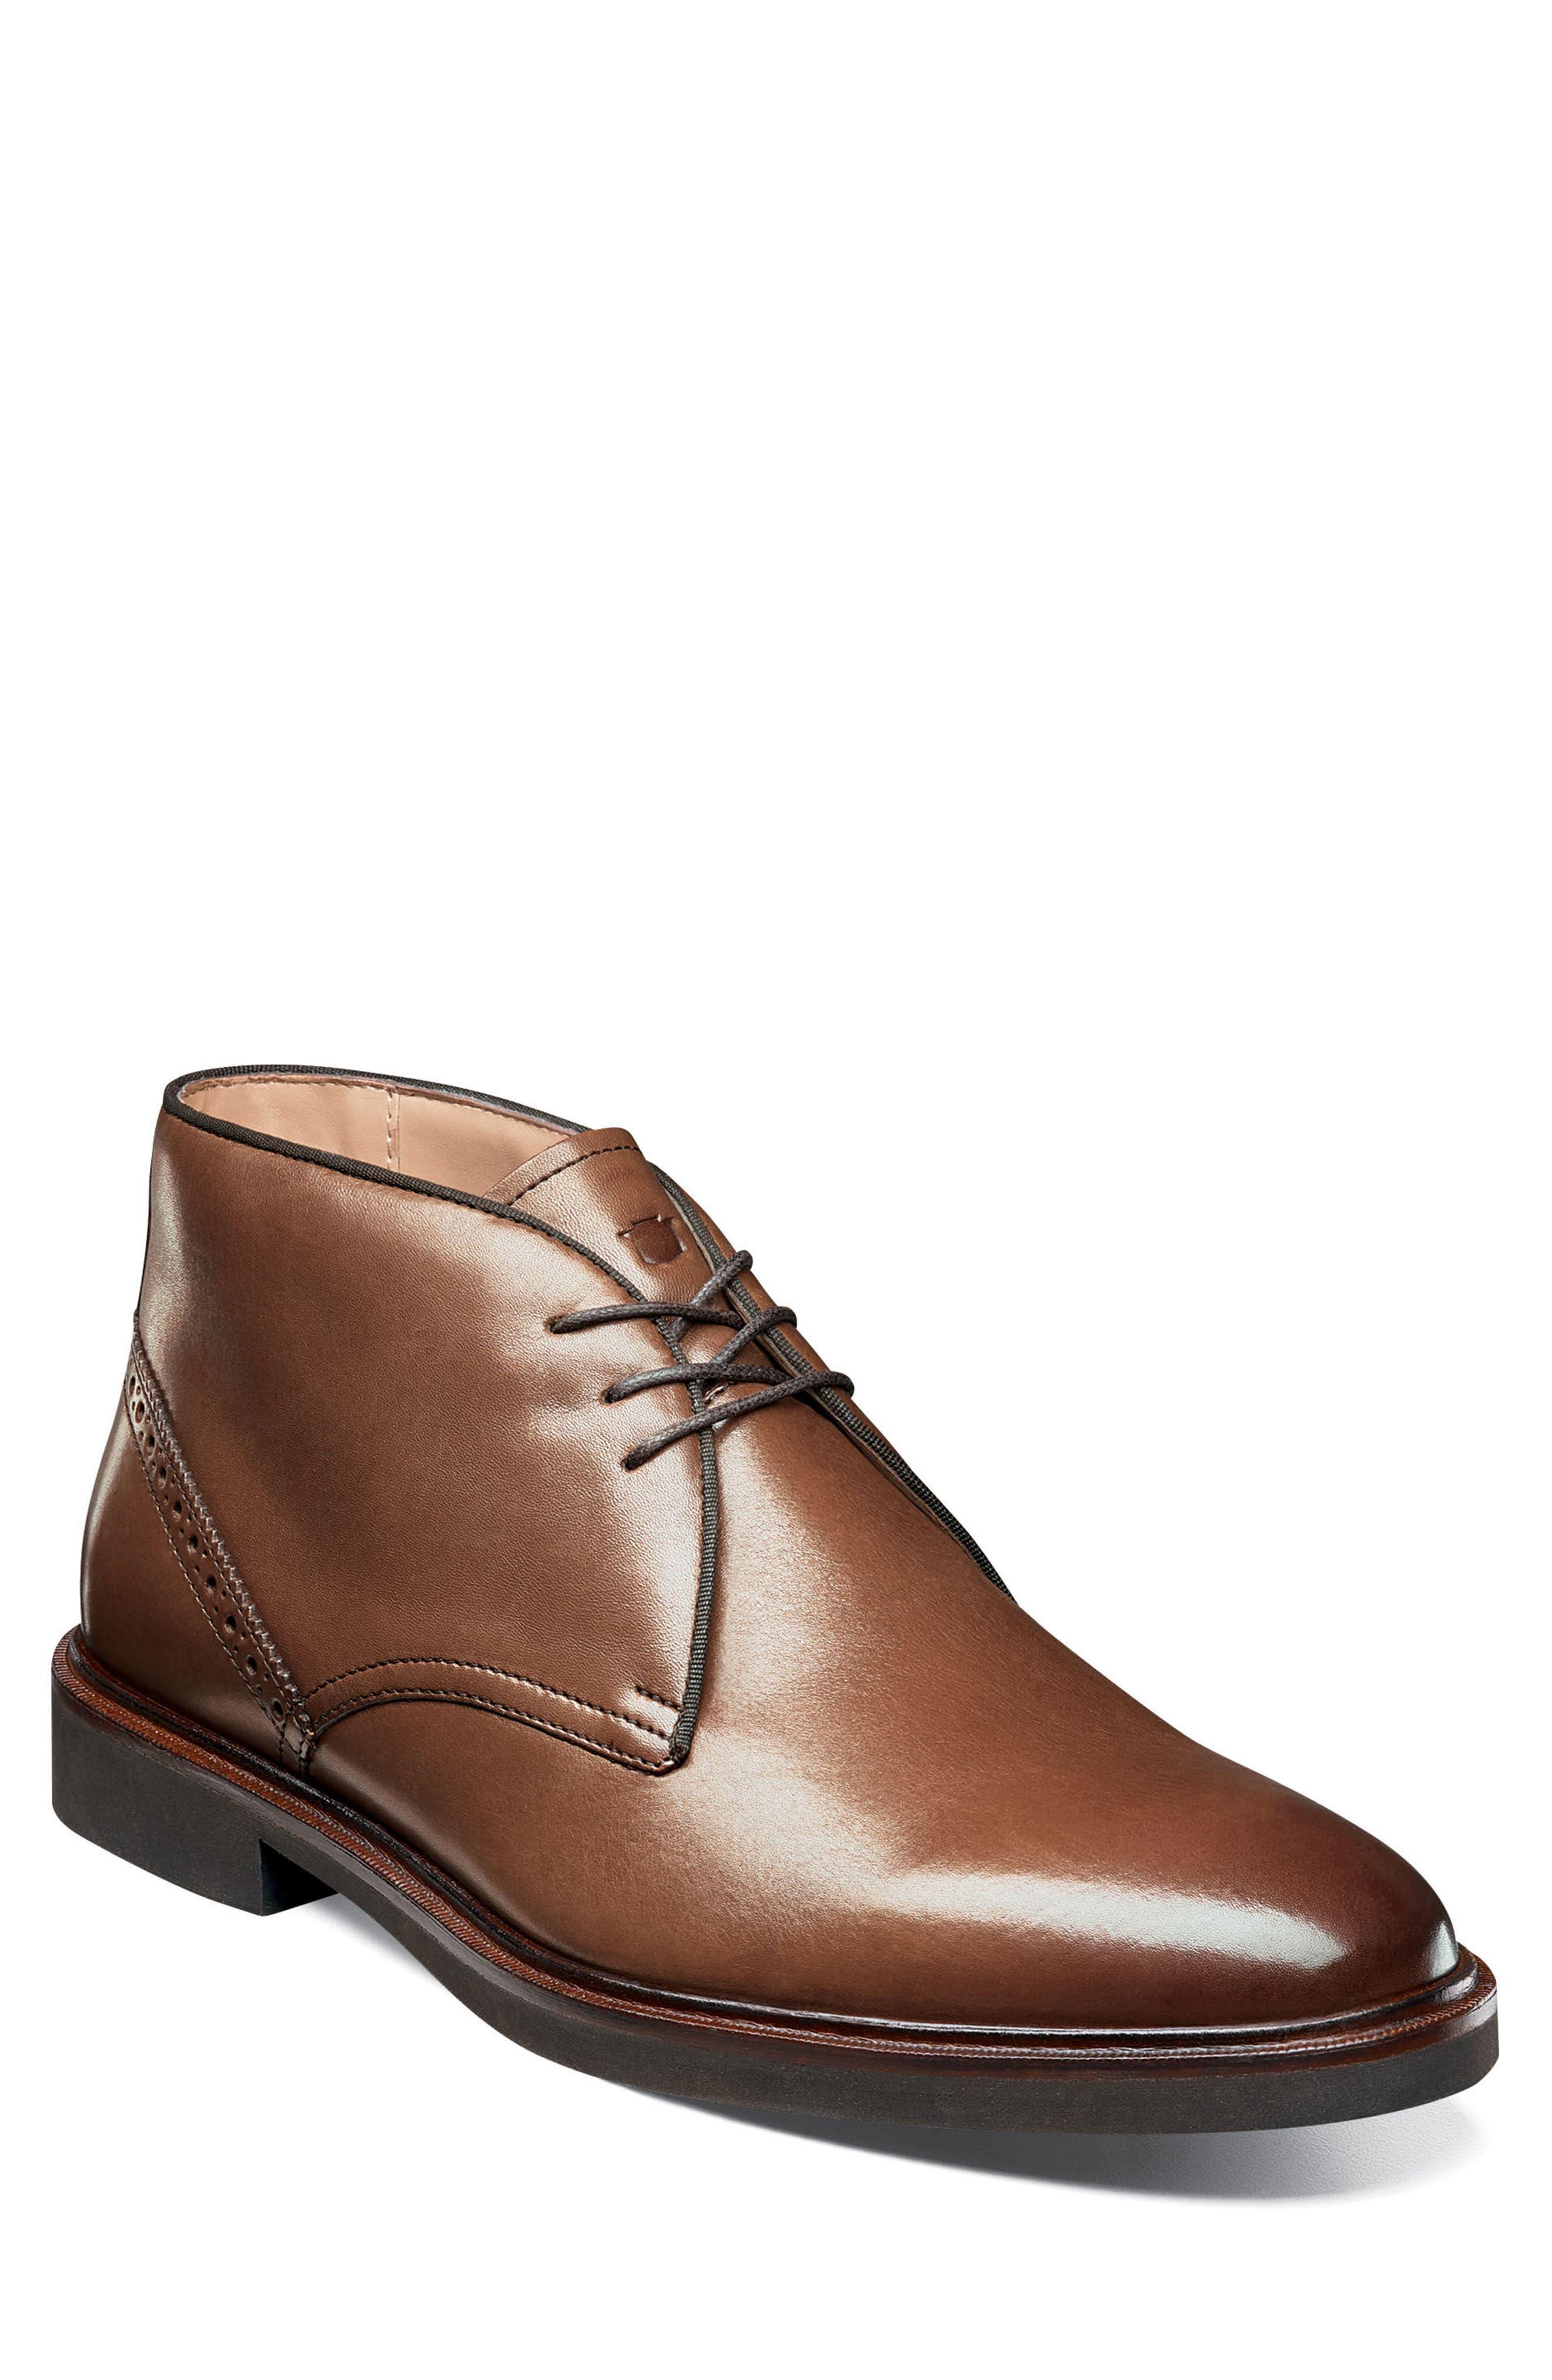 Alternate Image 1 Selected - Florsheim Truman Chukka Boot (Men)